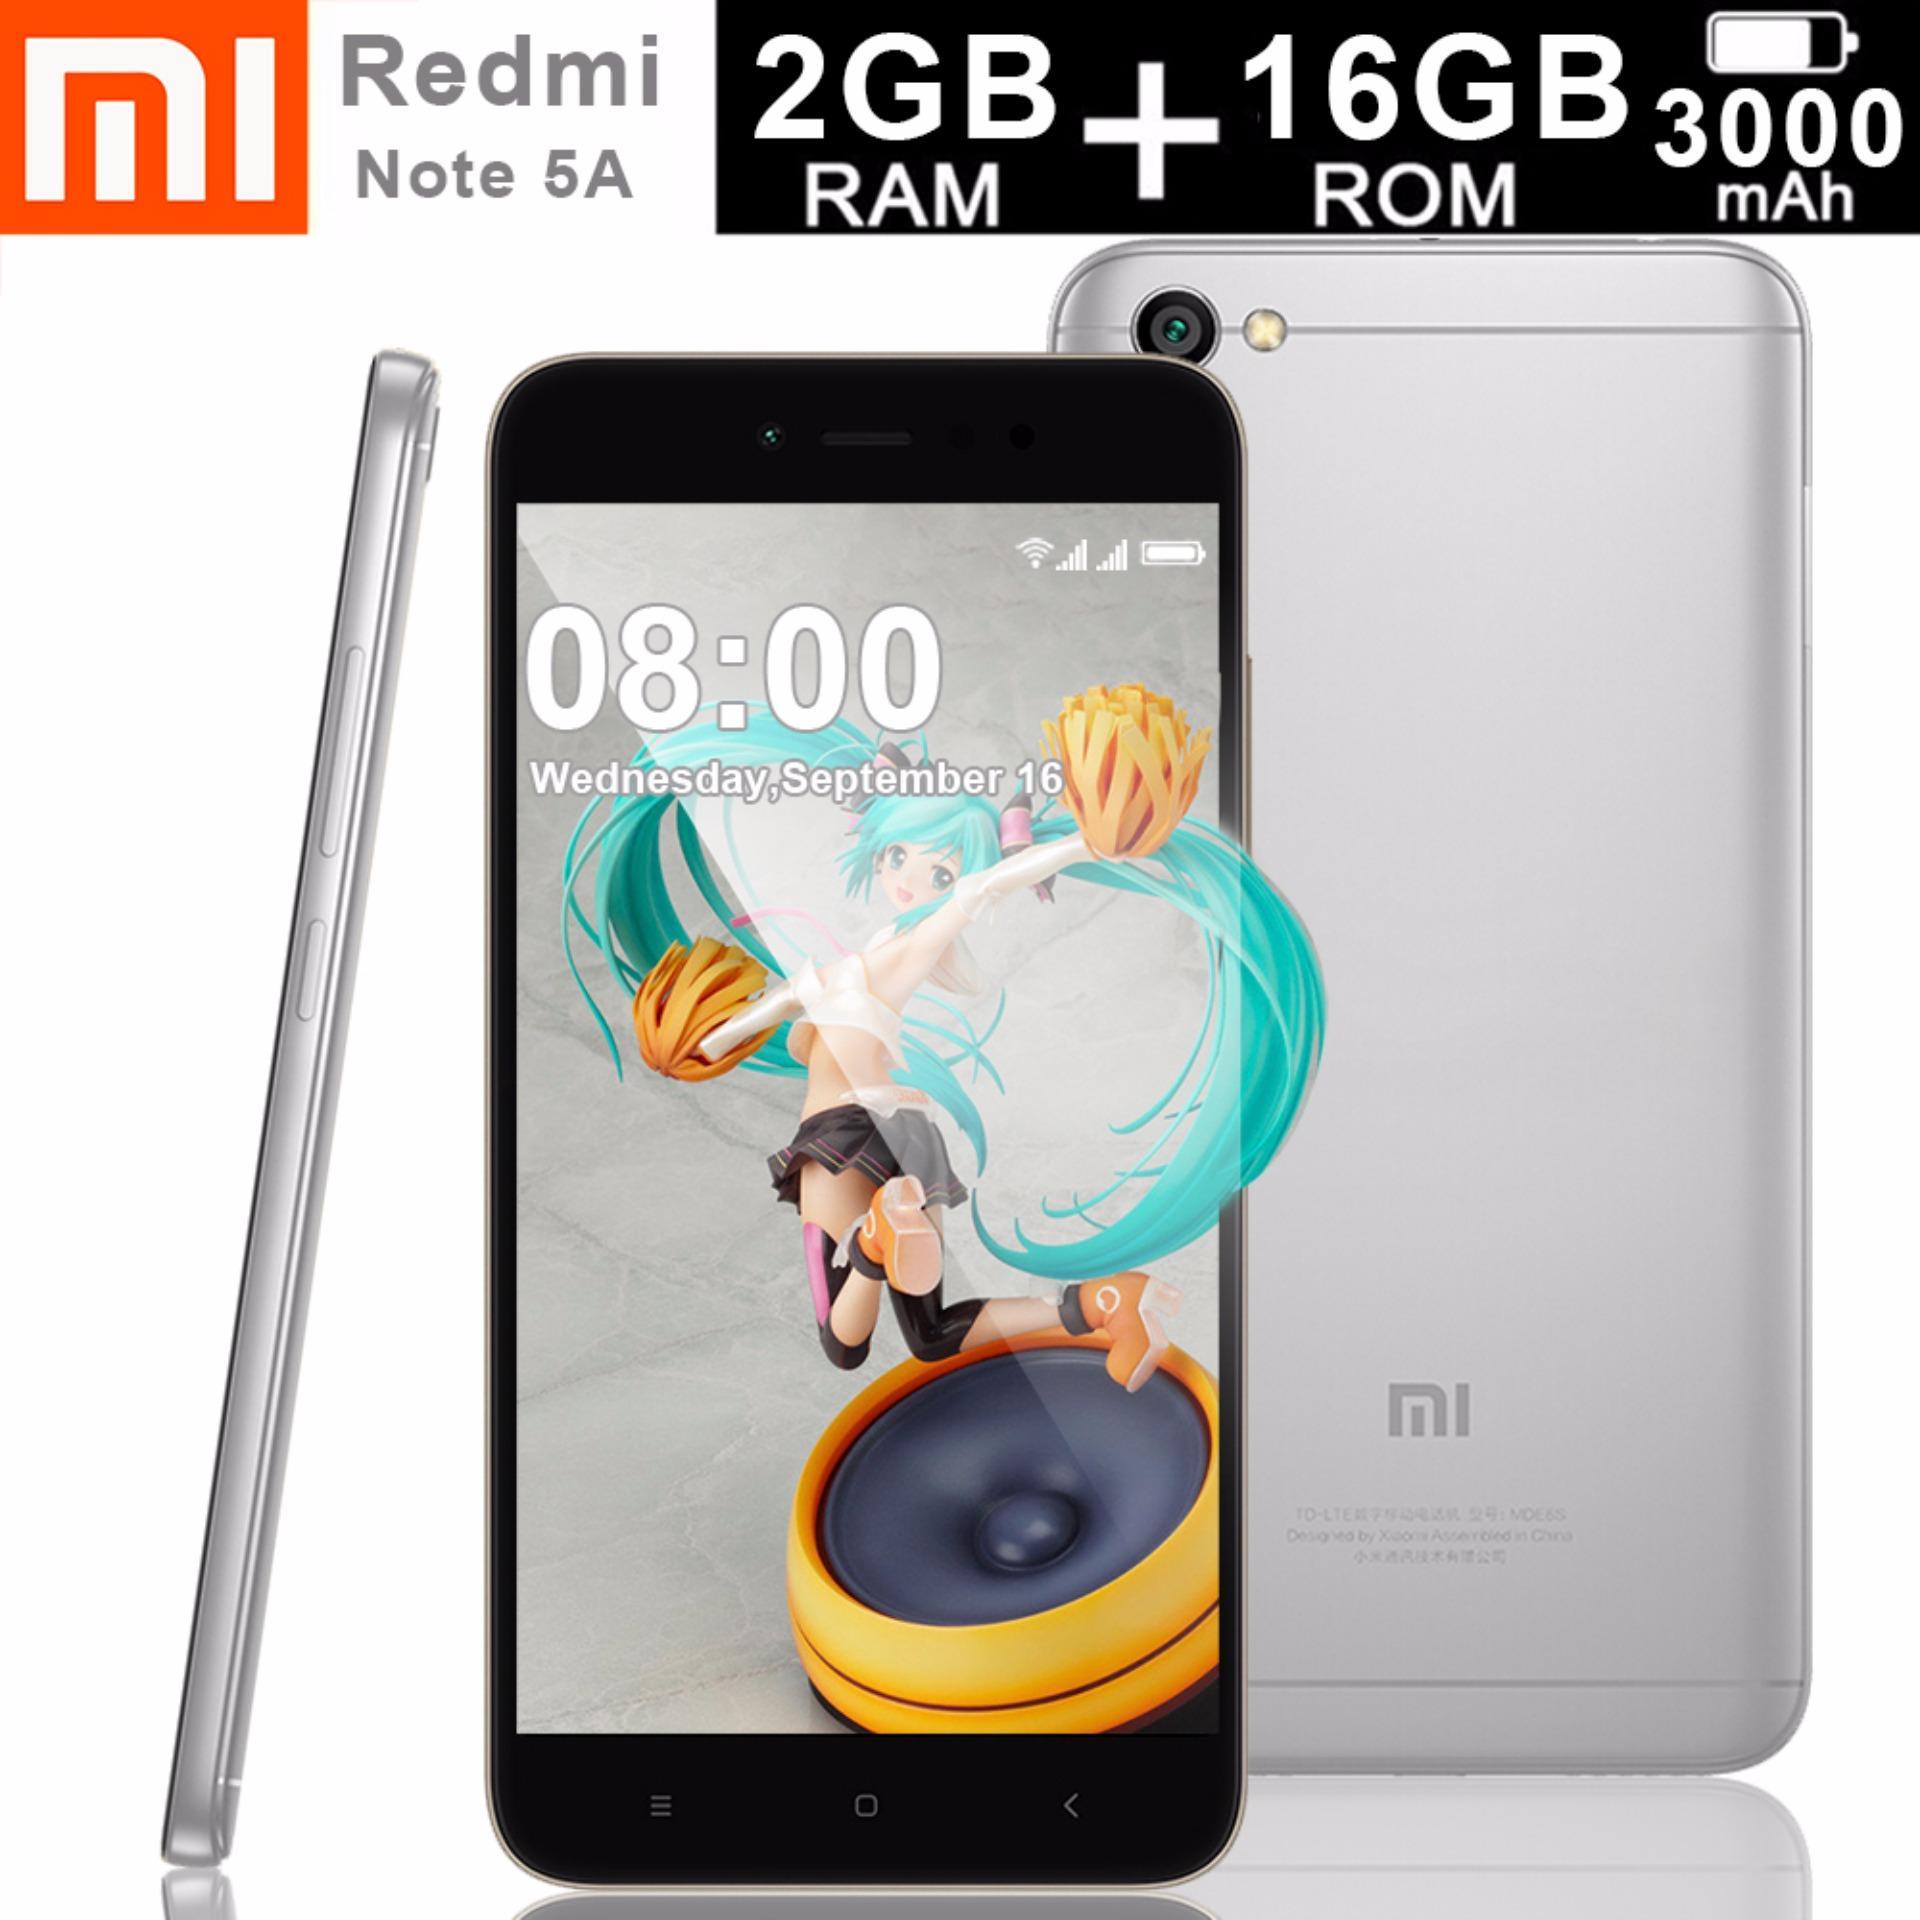 Xiaomi Redmi Note 5a 2gb Ram 16gb Rom Quad Core 14ghz Grey 2 Gb Internal 16 Philippines